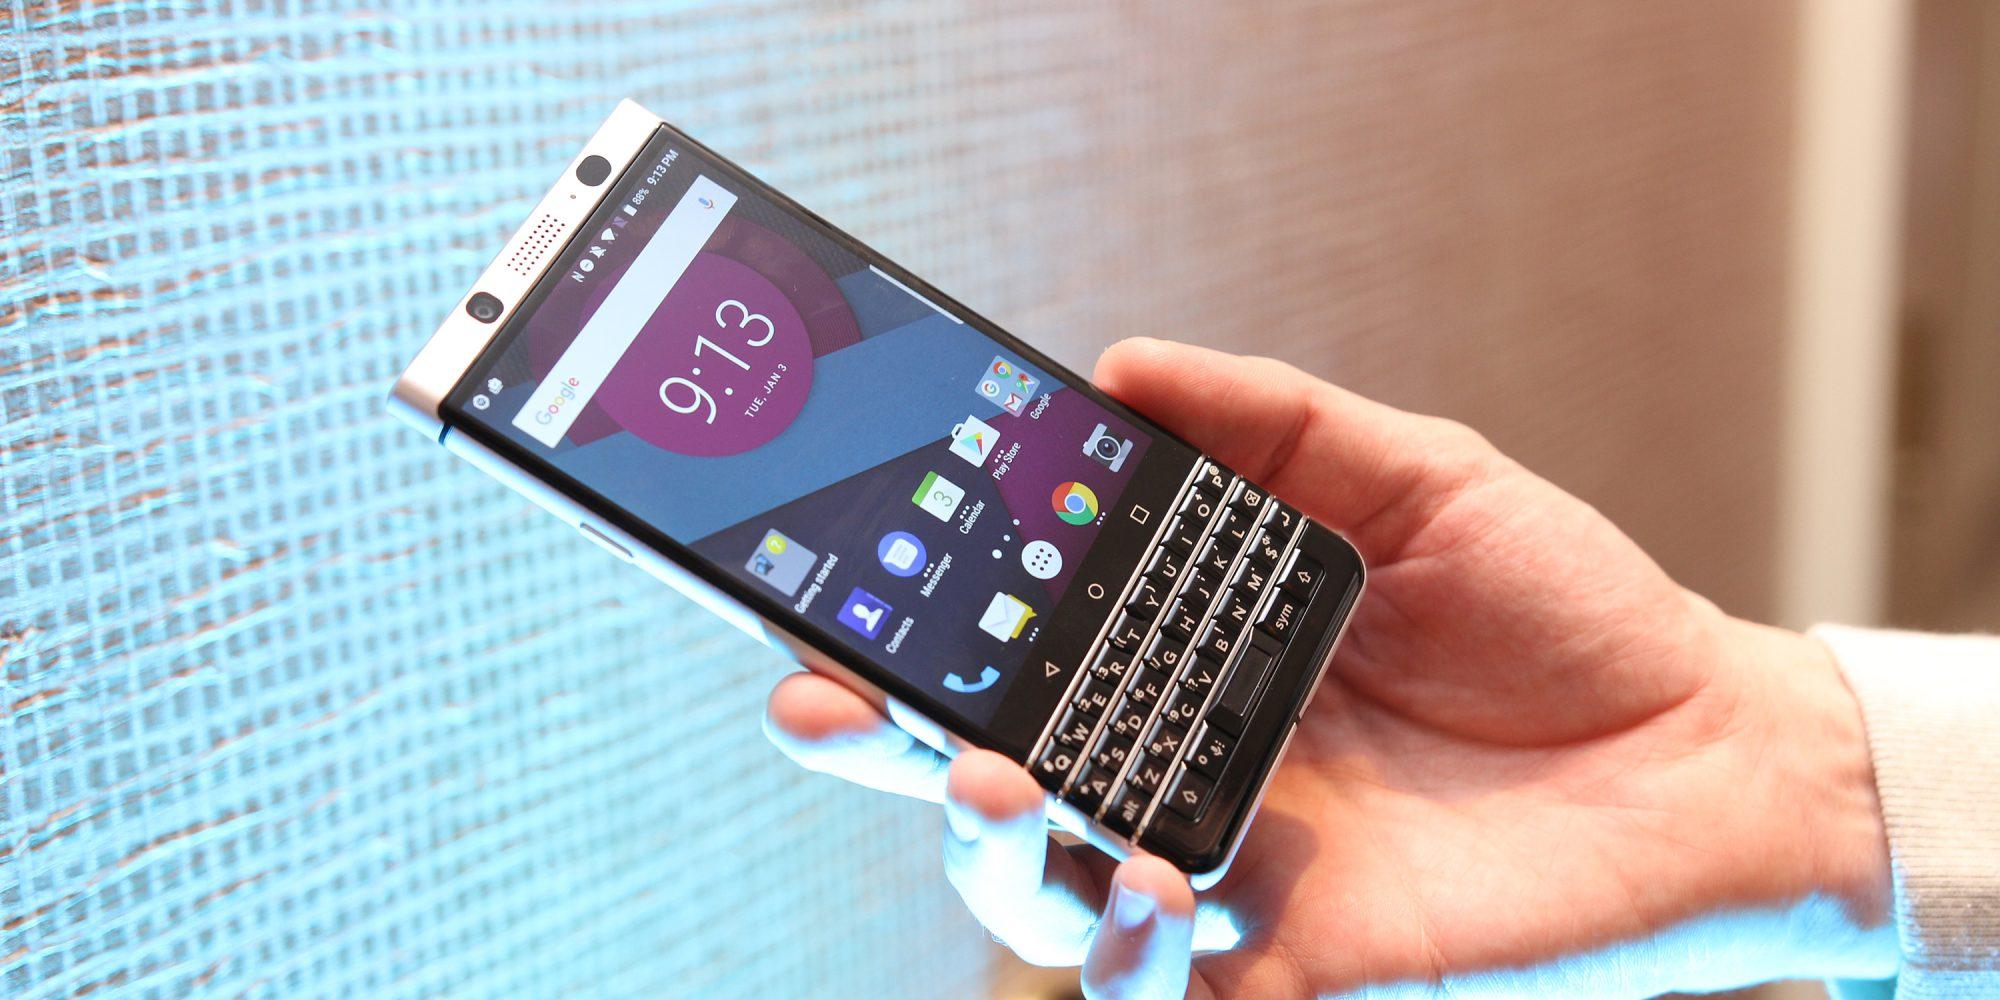 blackberrymercury4.jpg